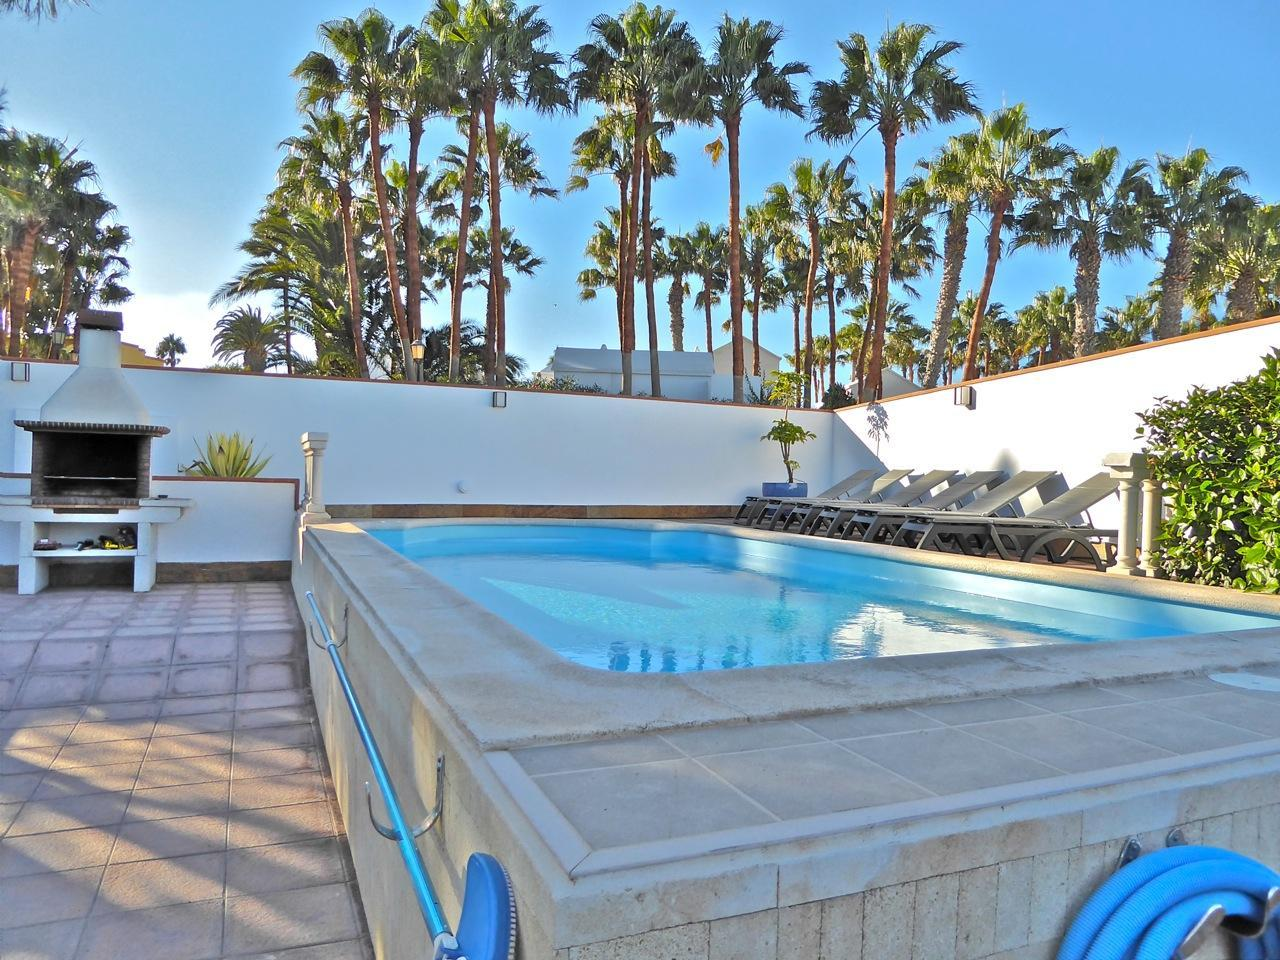 Ferienhaus Ferienhäuser Panorama Jardin (318122), Costa Calma, Fuerteventura, Kanarische Inseln, Spanien, Bild 13